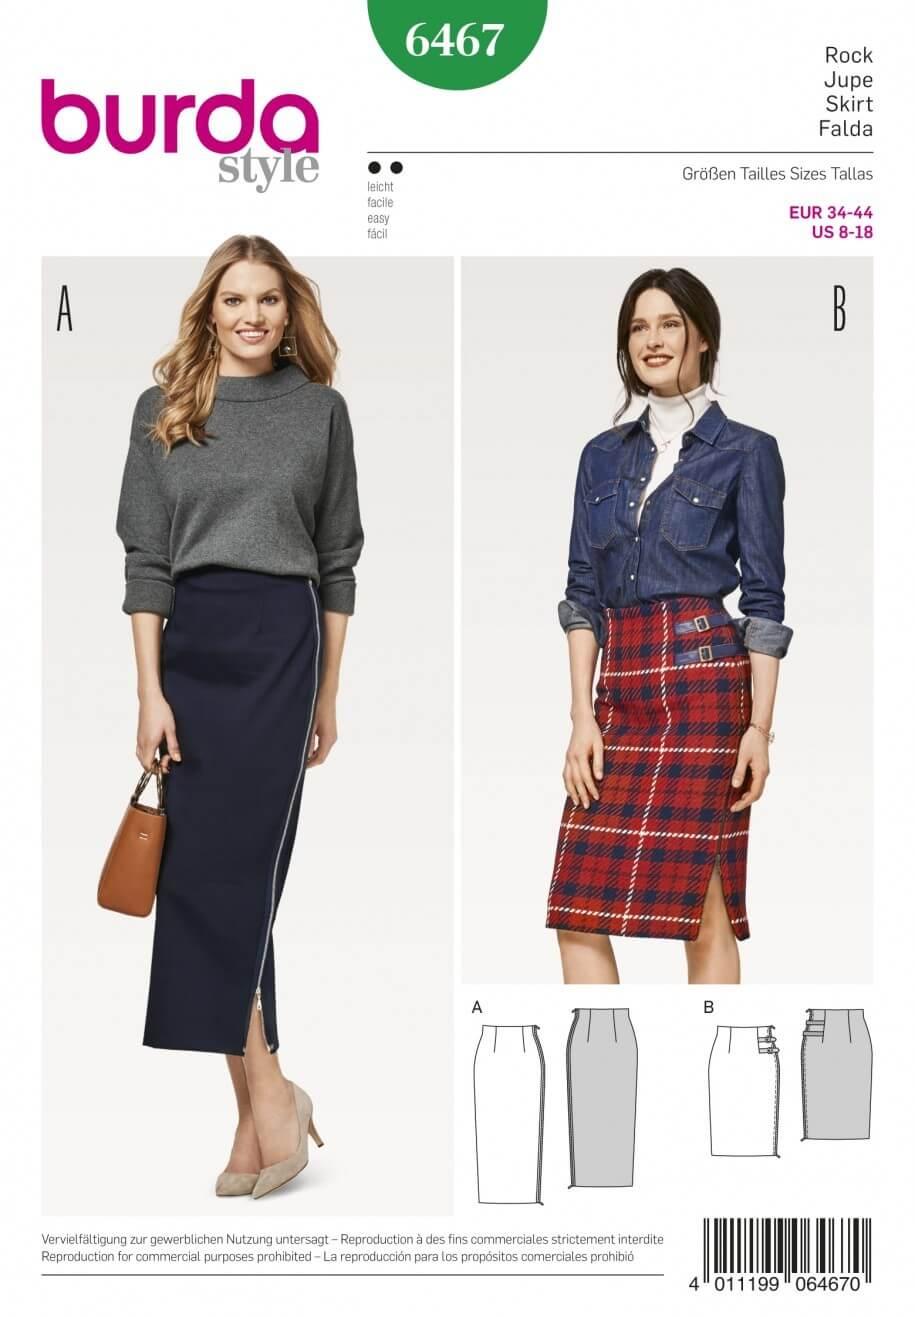 Burda Style Women's High Waisted Skirt Dress Sewing Pattern 6467